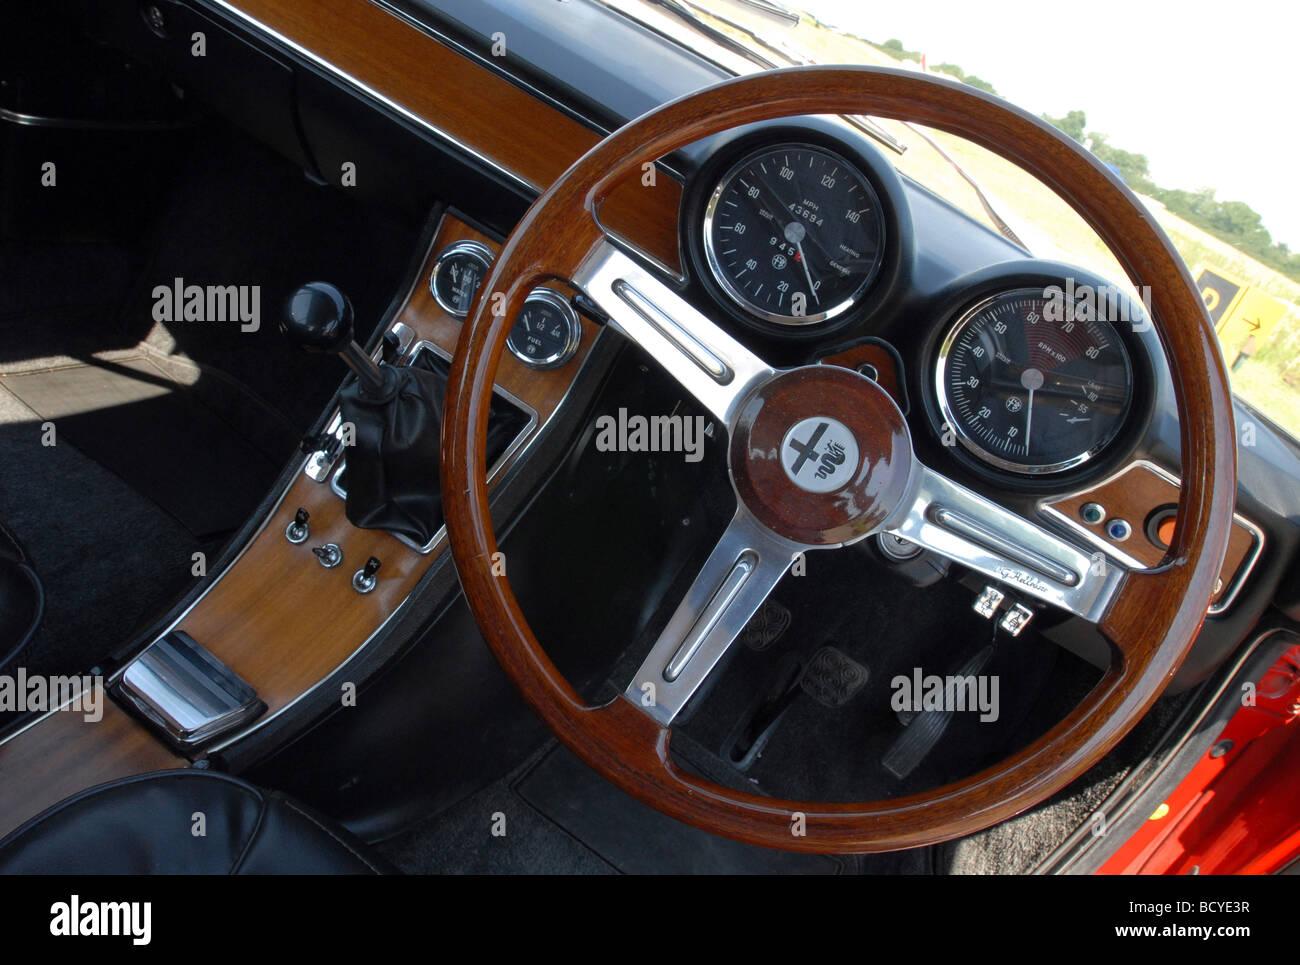 alfa romeo gtv 1750 coupe classic red italian sports car interior stock photo 25190027 alamy. Black Bedroom Furniture Sets. Home Design Ideas